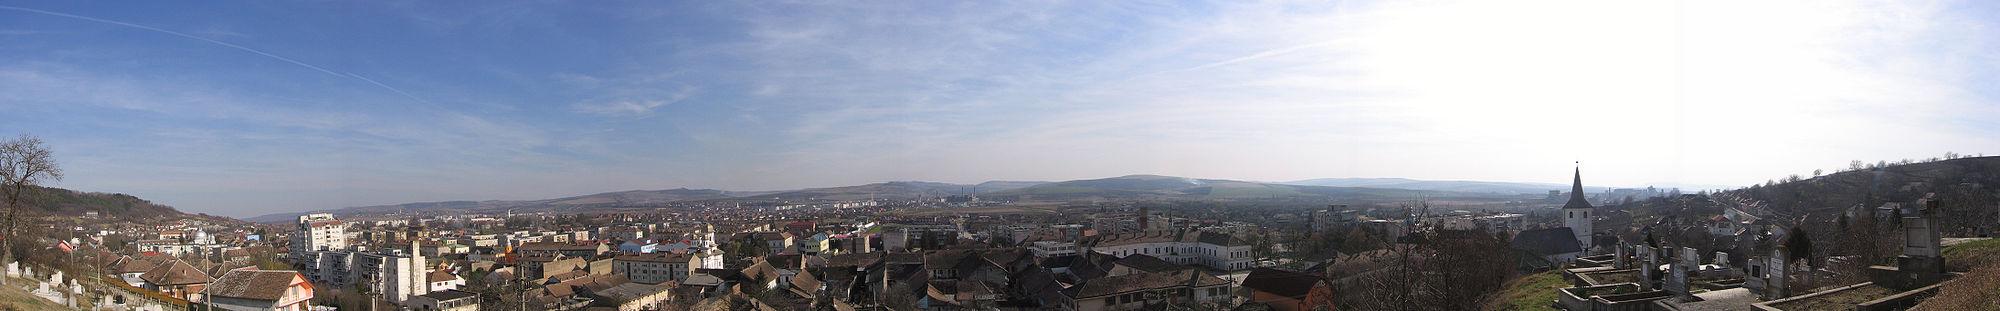 Tarnaveni-PanoramicView